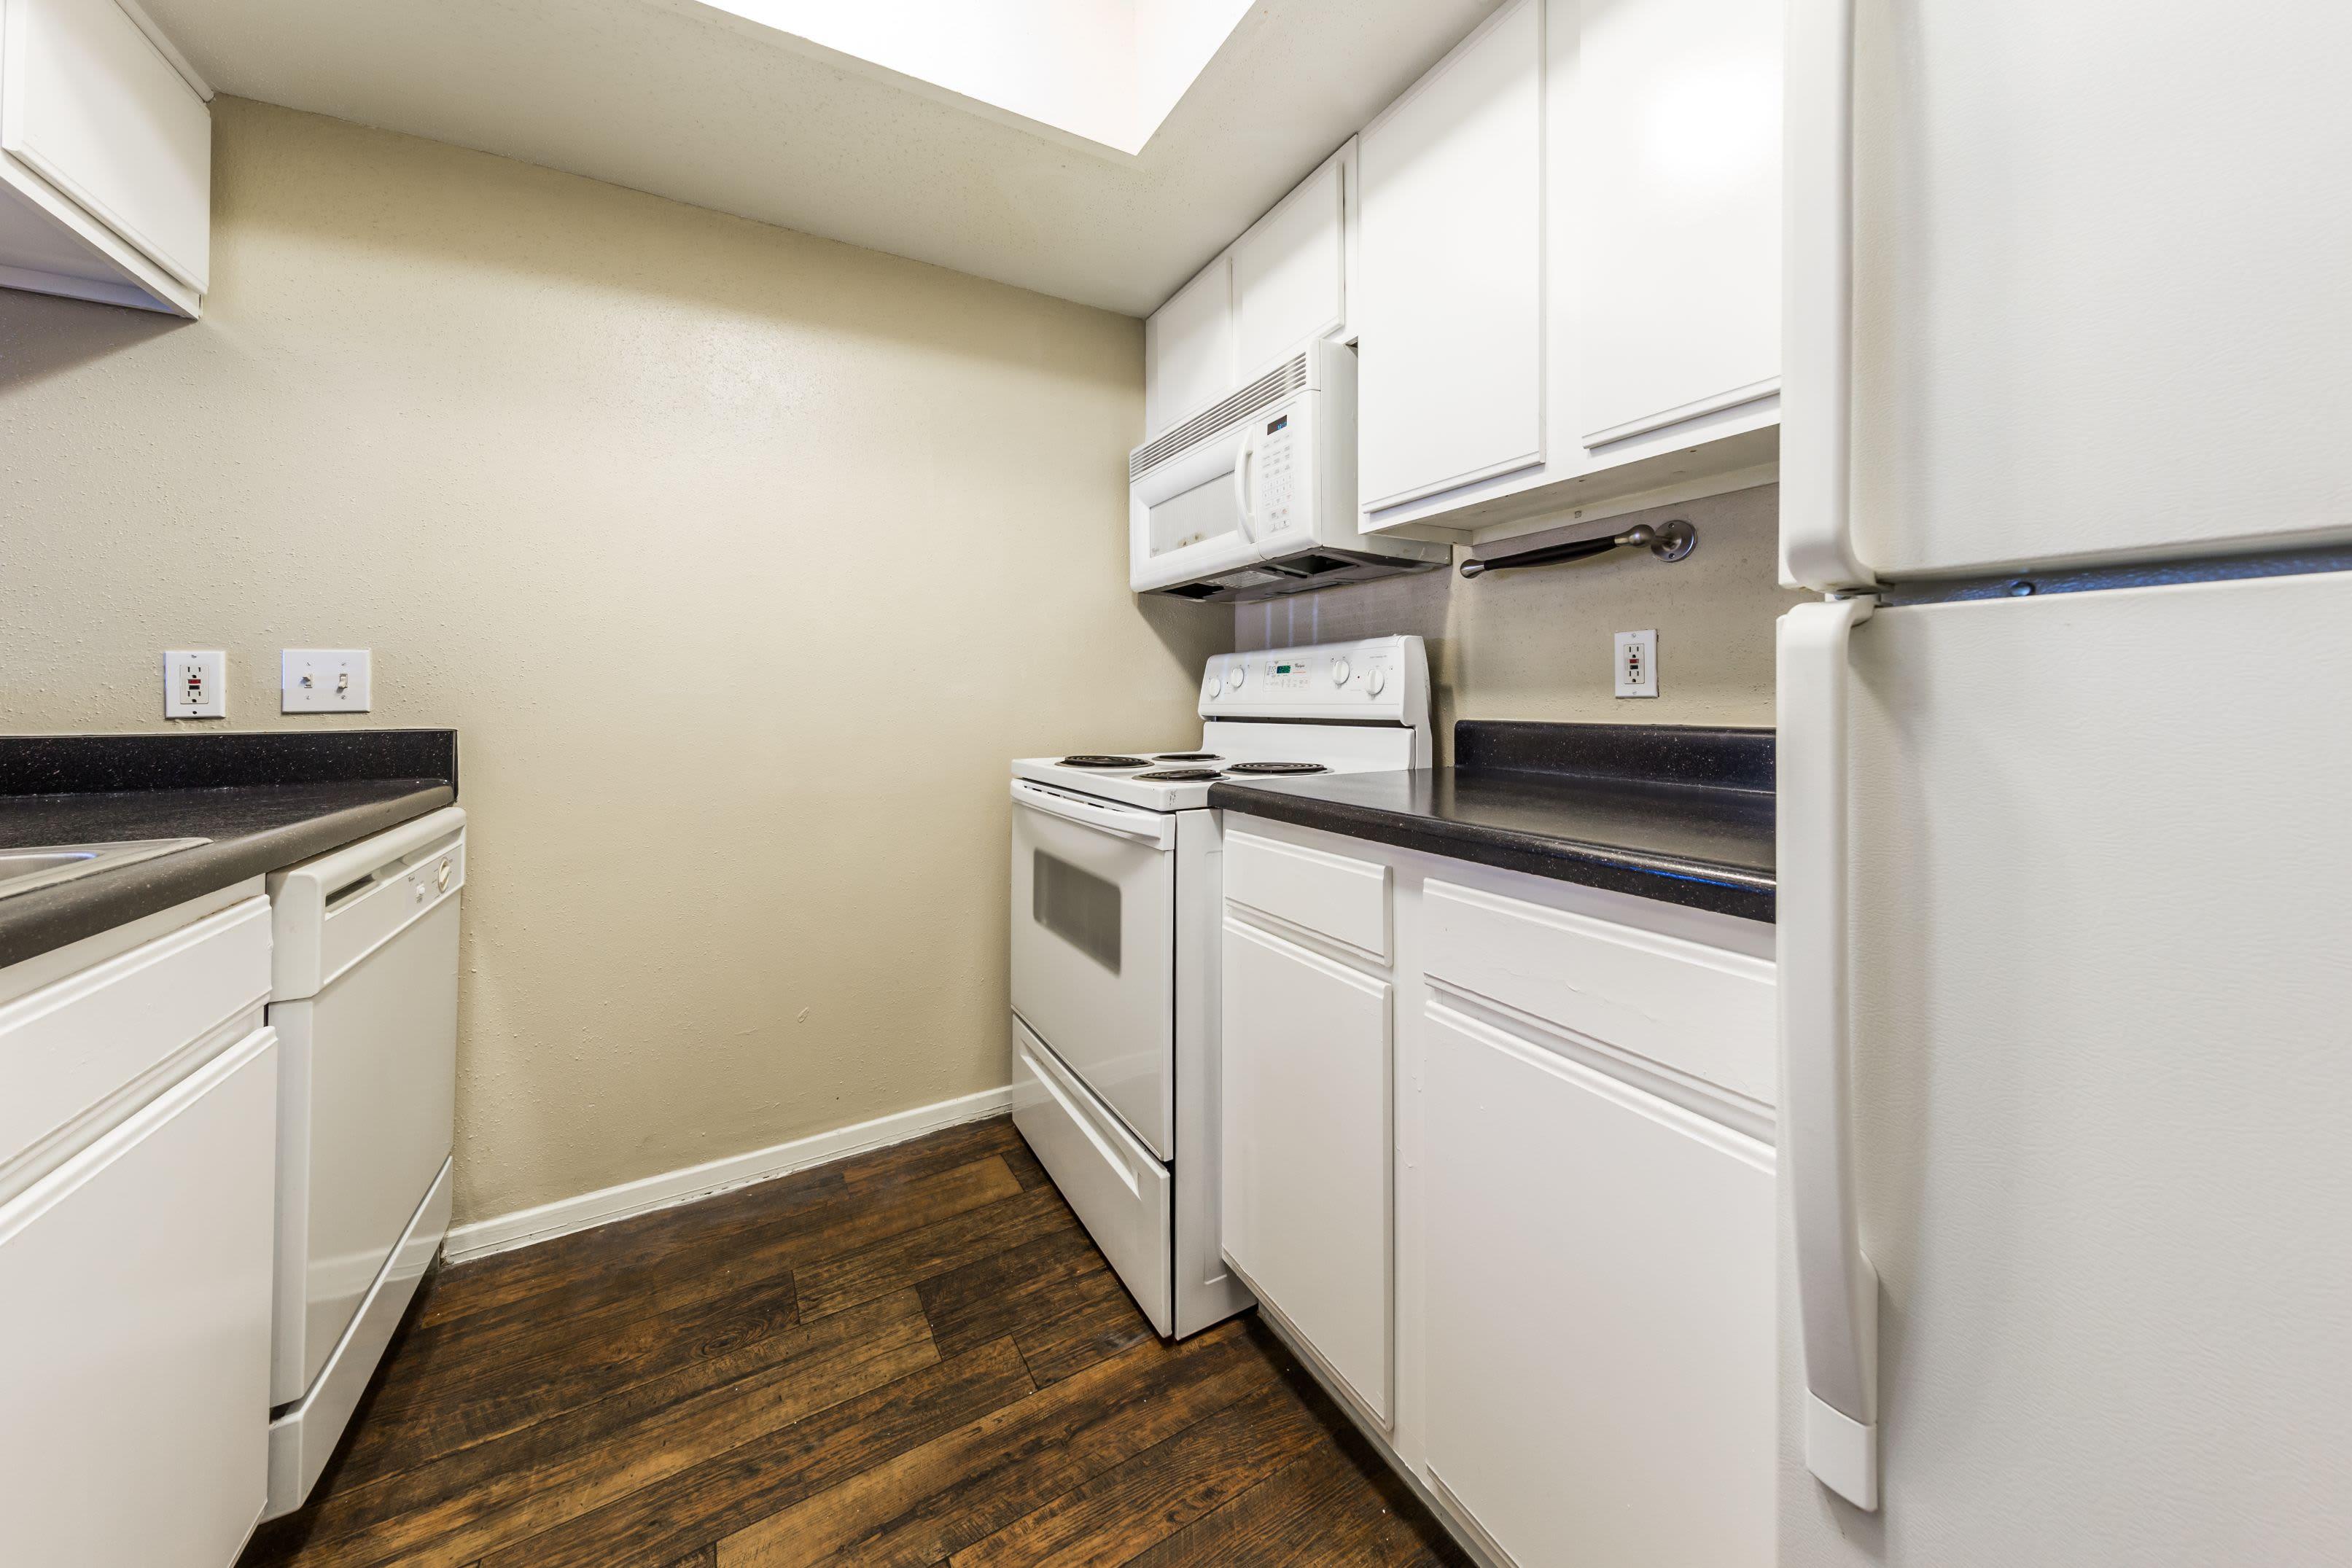 Kitchen with white appliances at SoCo on The Lake in Austin, Texas